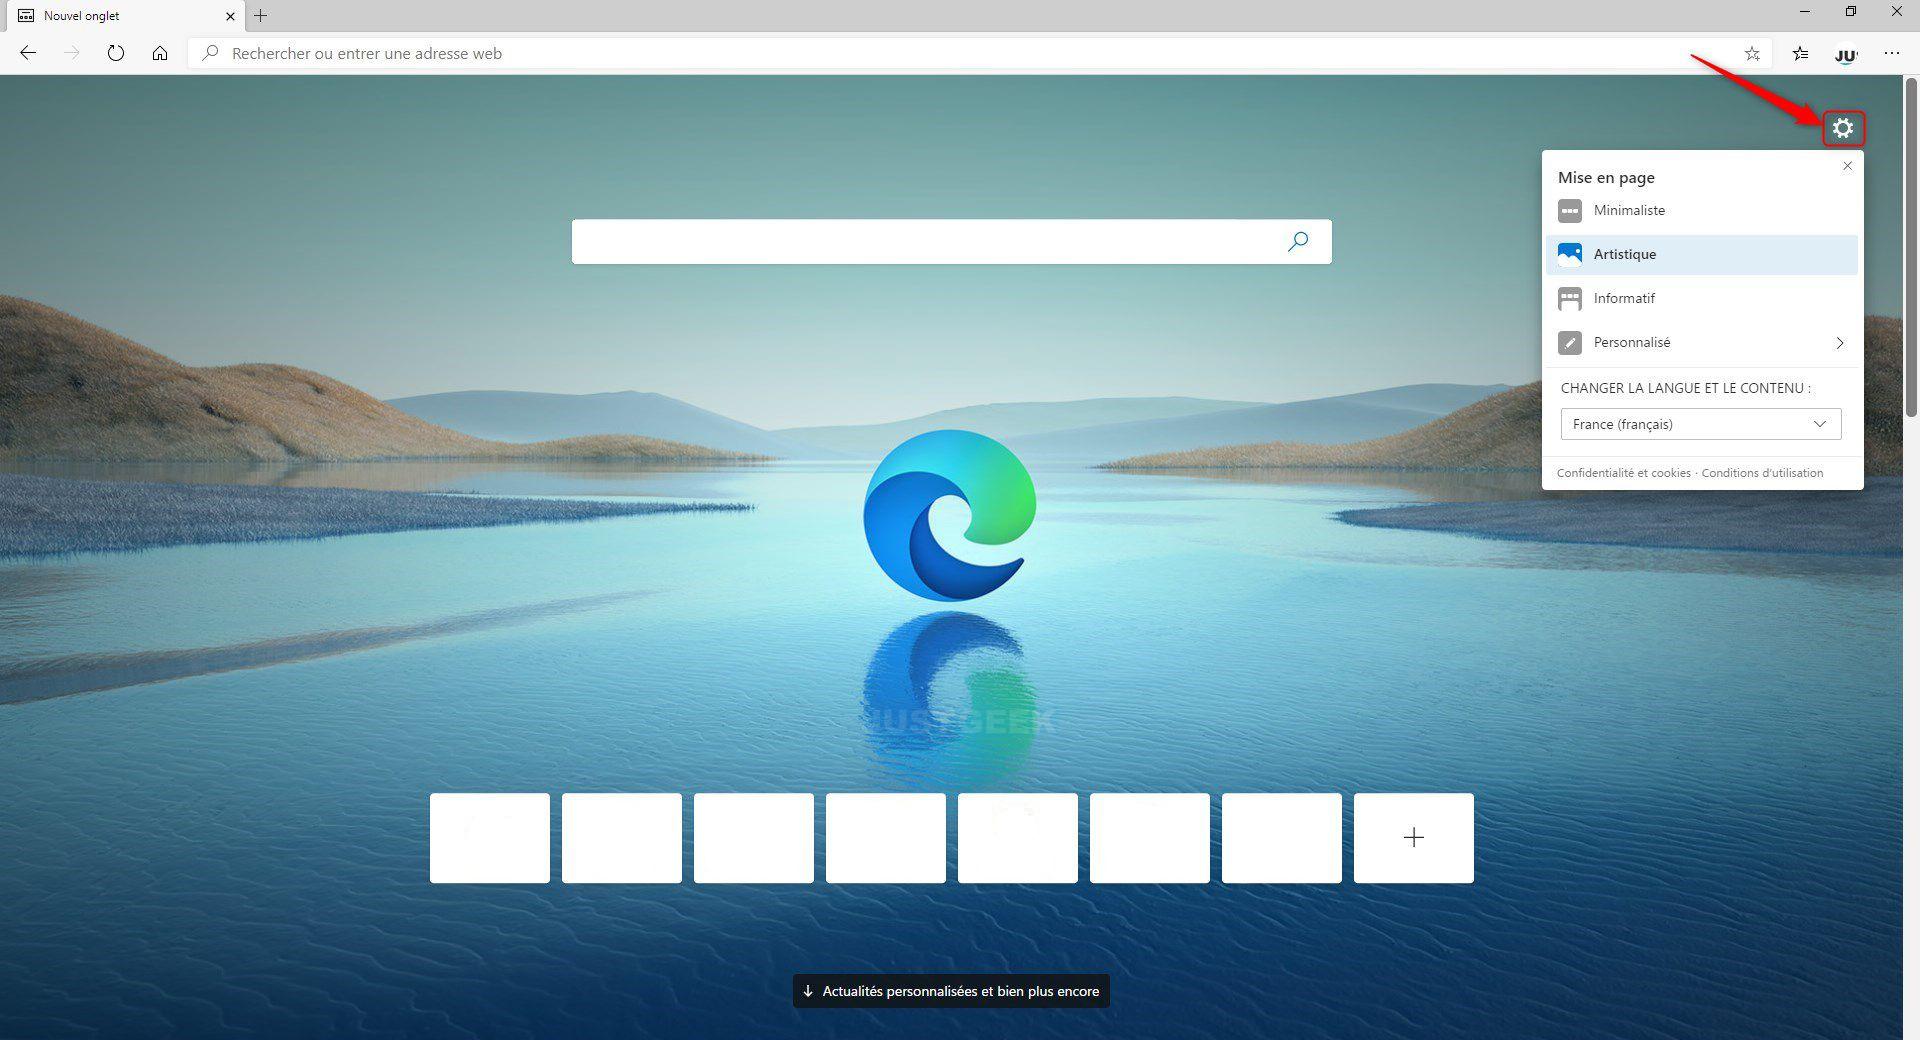 Personnaliser la page Nouvel onglet Microsoft Edge